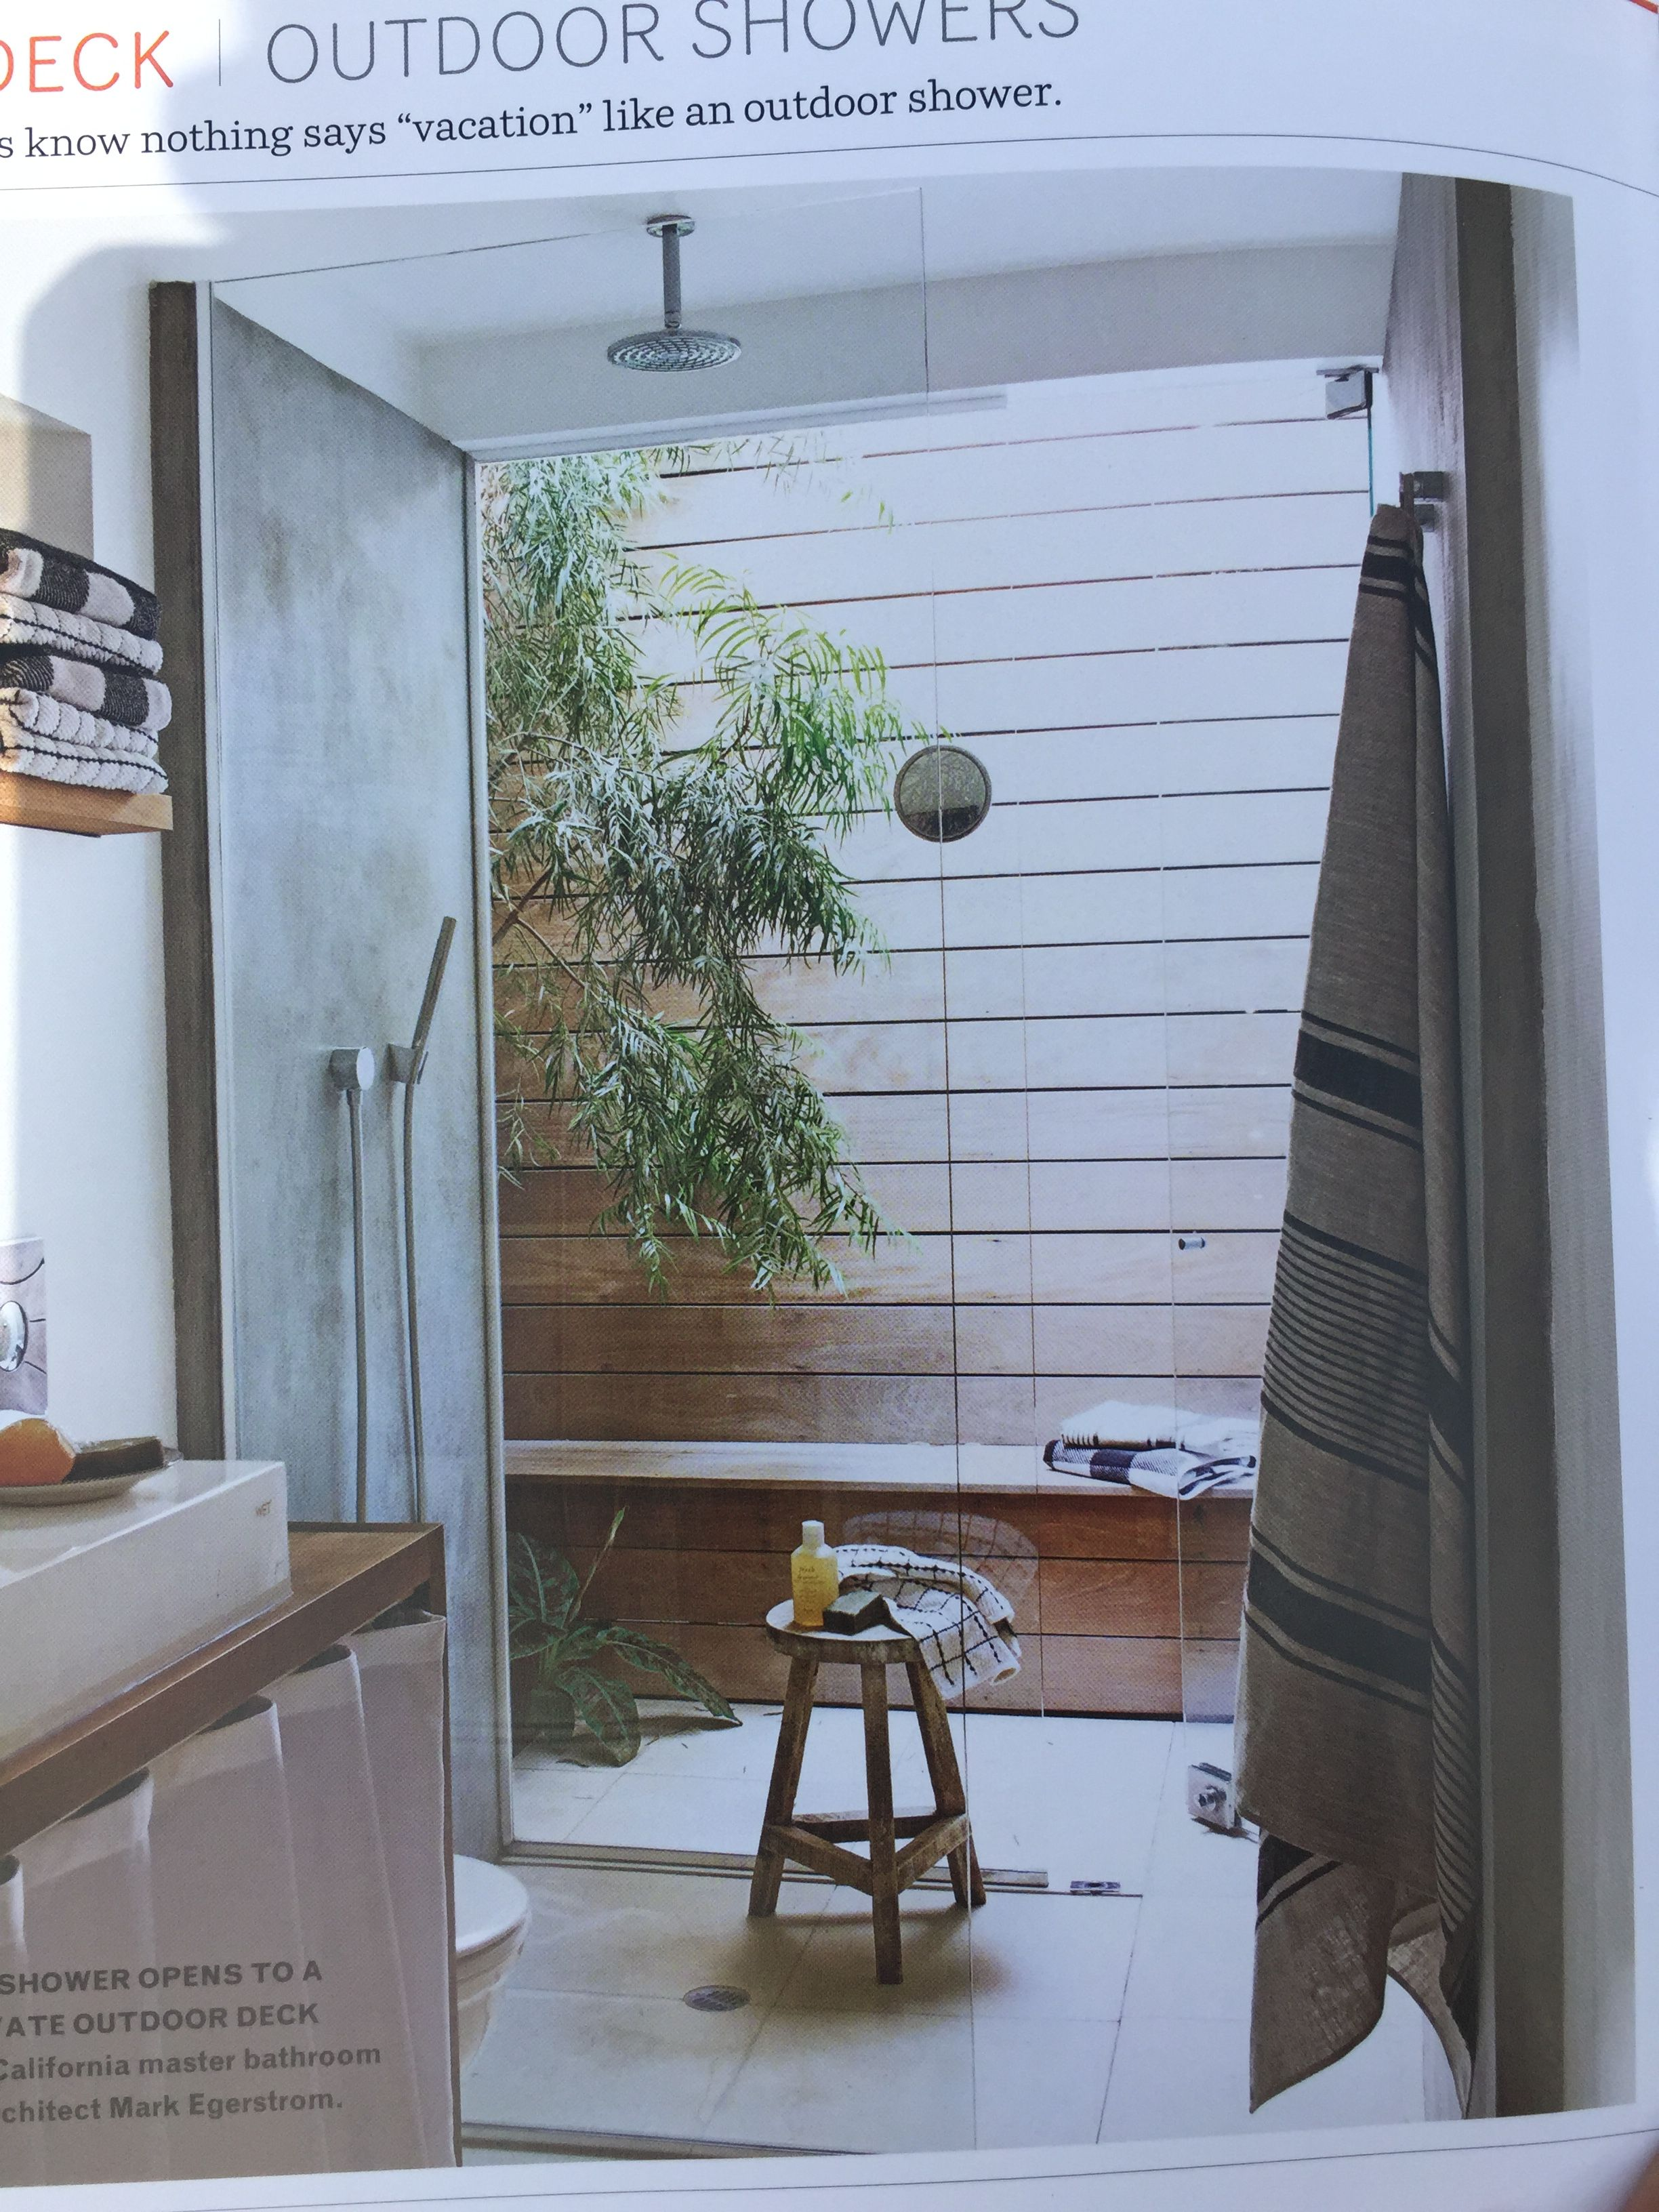 Pin by jane nicolais on interior ideas pinterest interiors